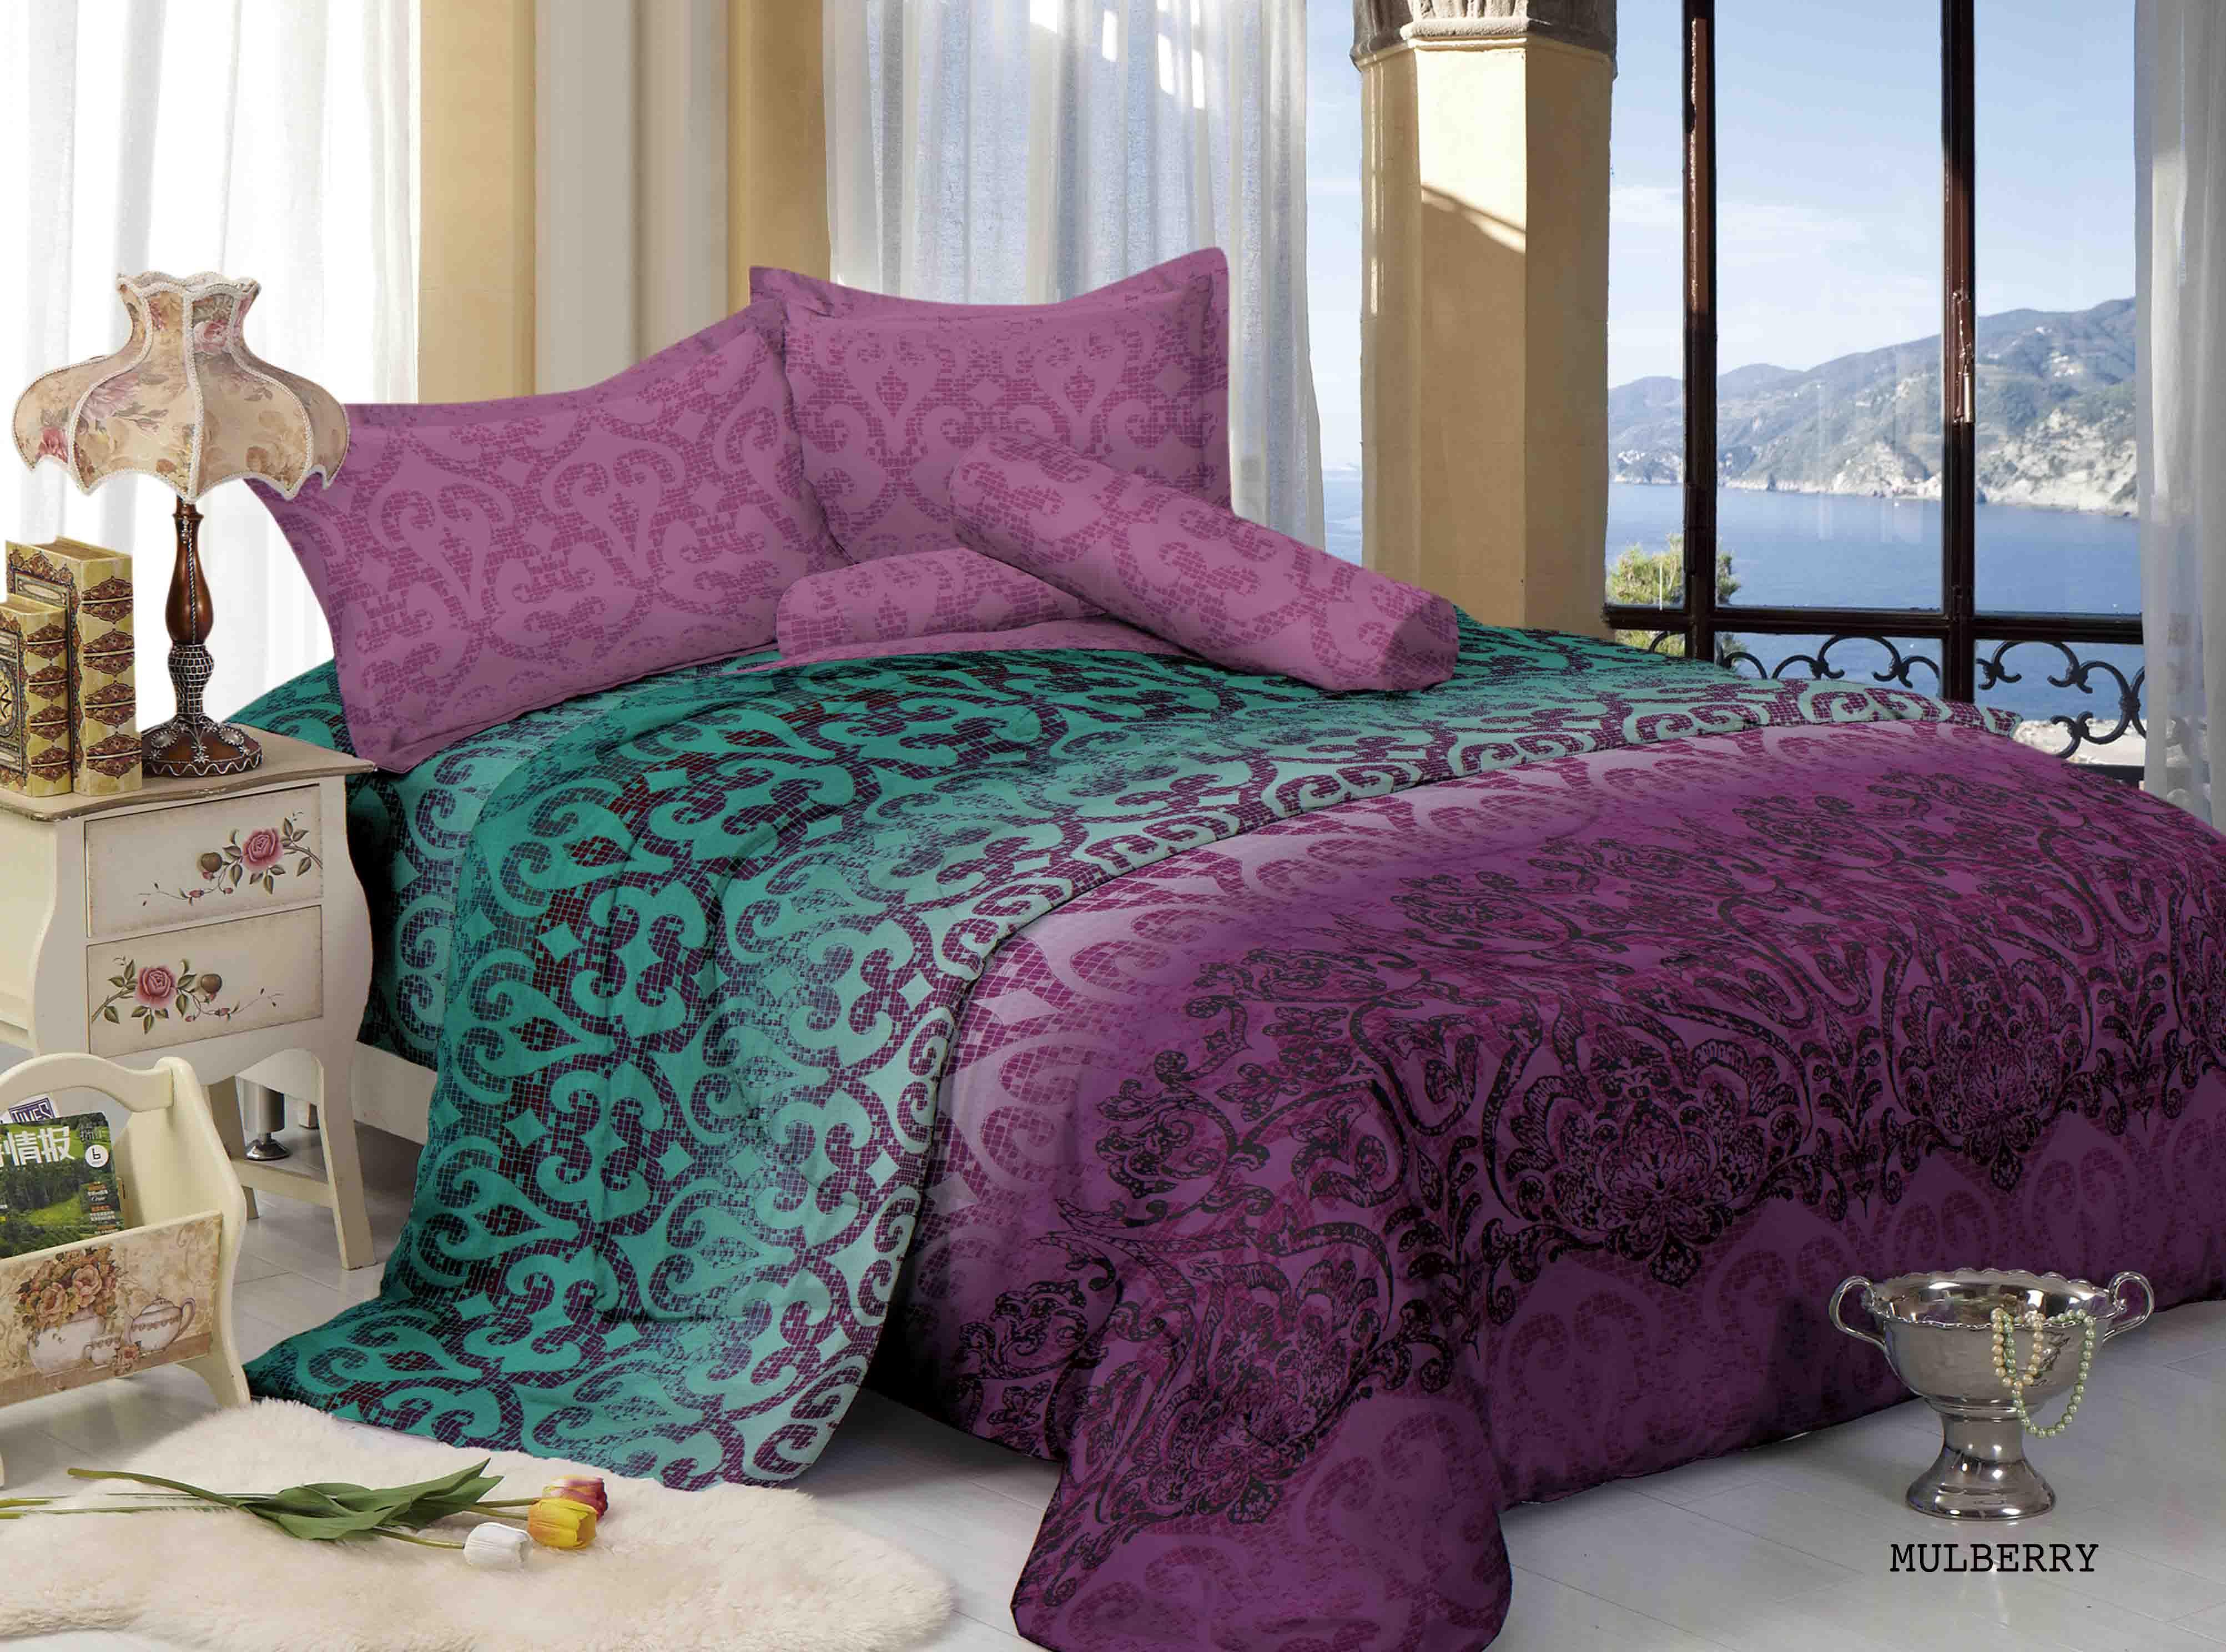 Mulbery Design Abstract Yan Gmemiliki Kombinasi Warna Yang